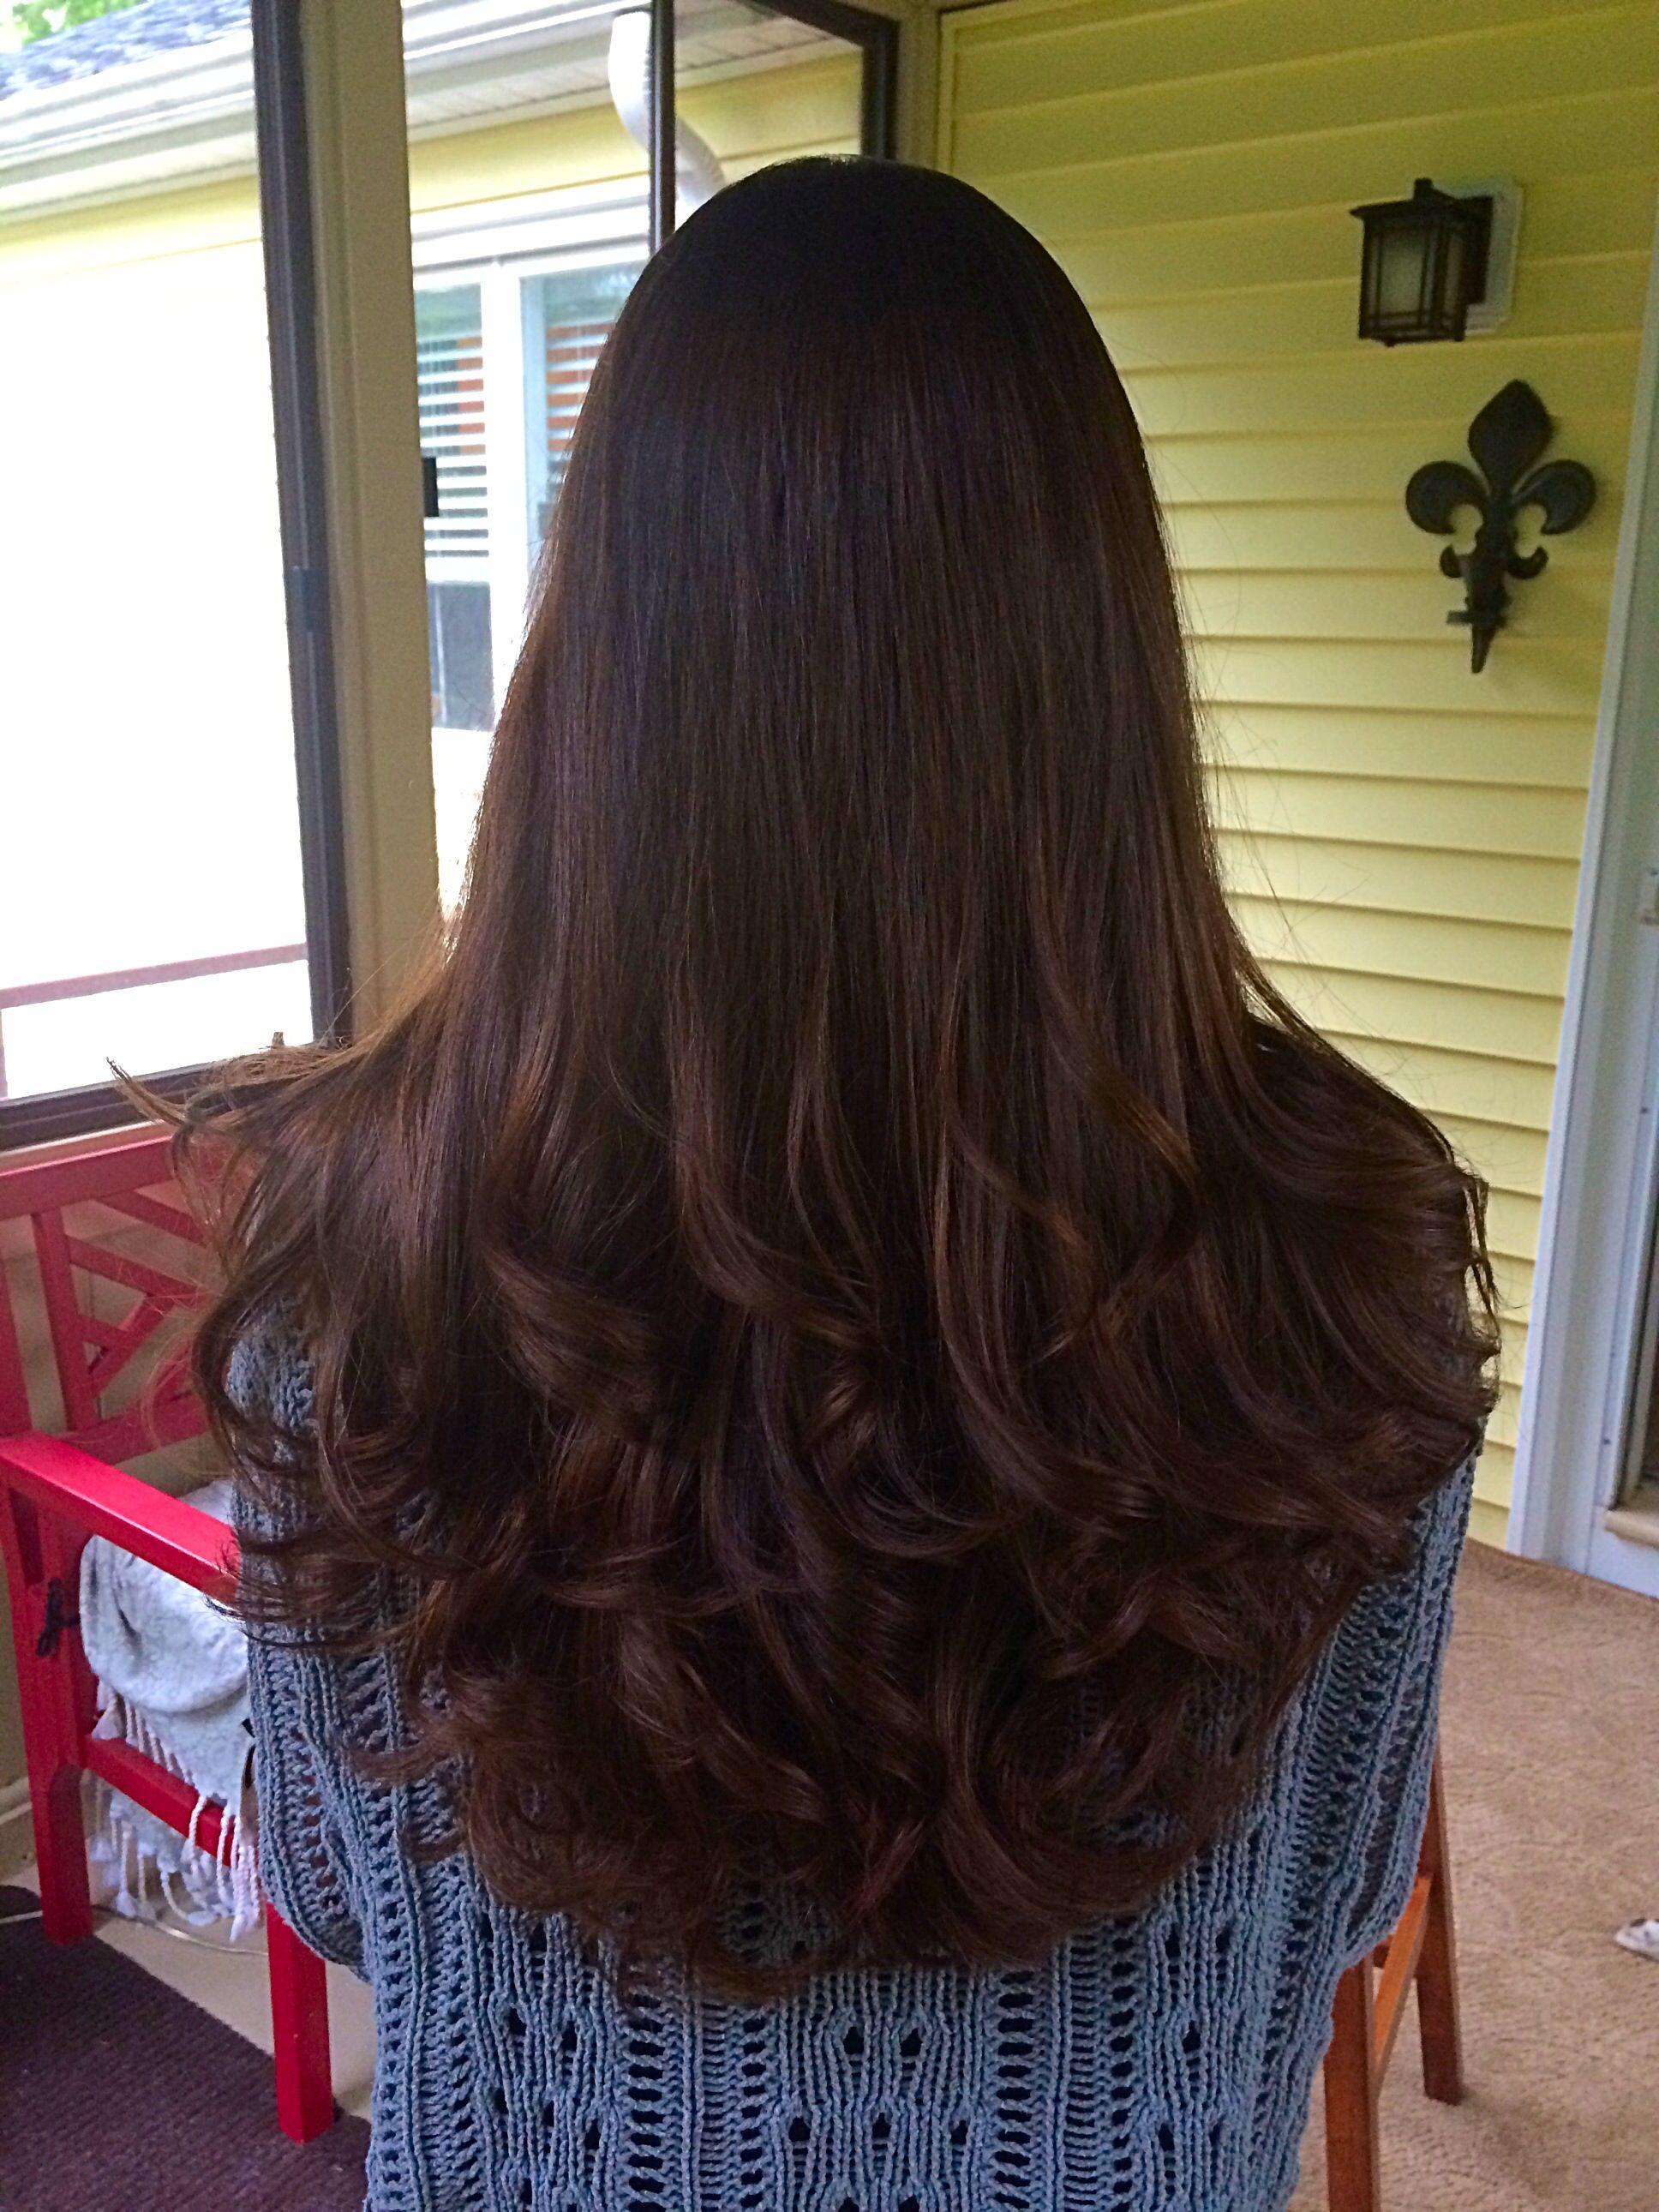 Long Layered Victoria Secret V Shape Haircut For Long Hair Long Hair Styles Haircuts For Long Hair Long Hair Trends